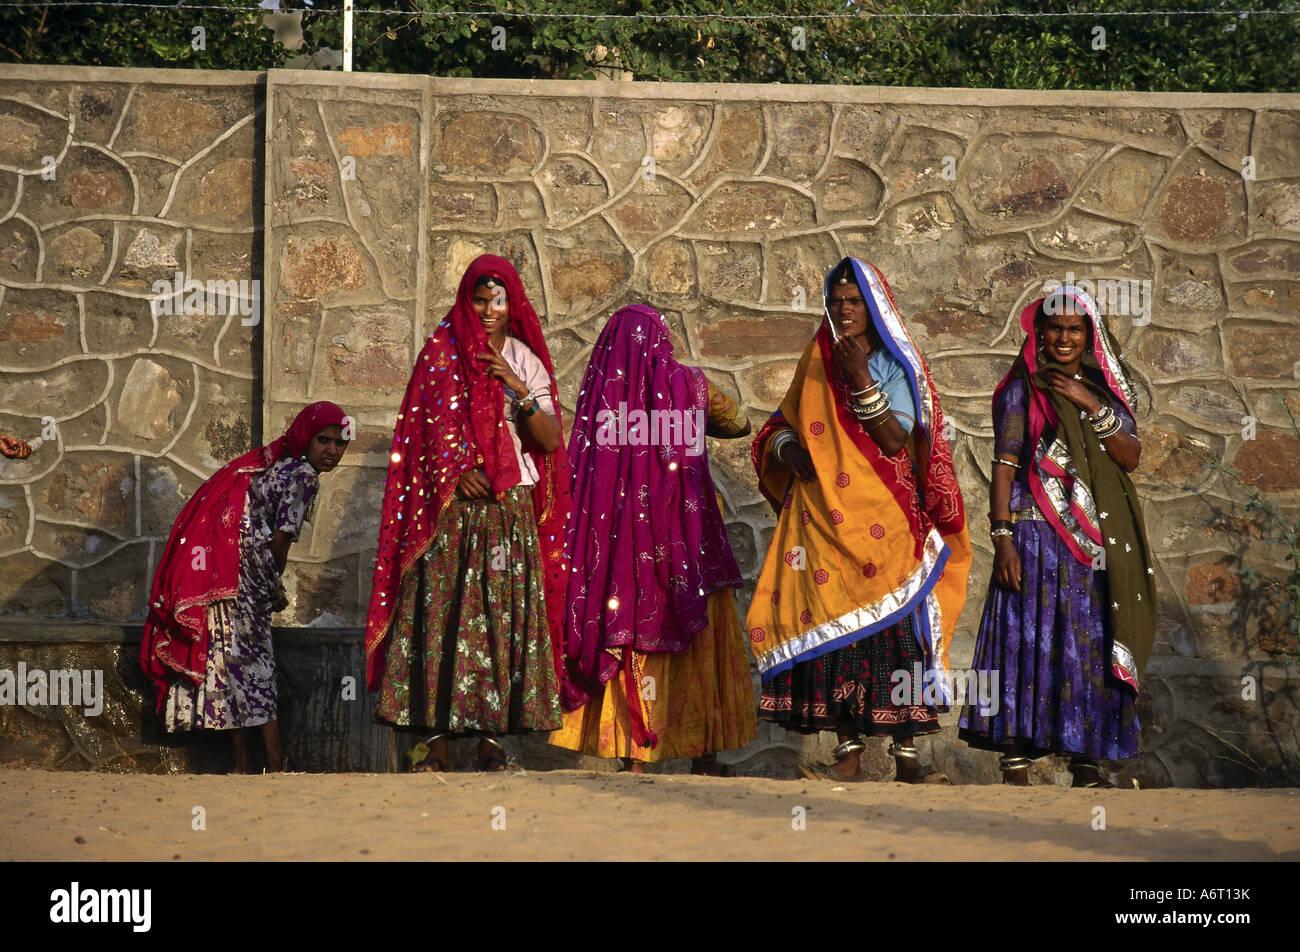 Algunas personas, mujeres, India, mujeres, lavarse, Pushkar, Rajastán, Asia, mujer, higiene personal, Sari, Imagen De Stock